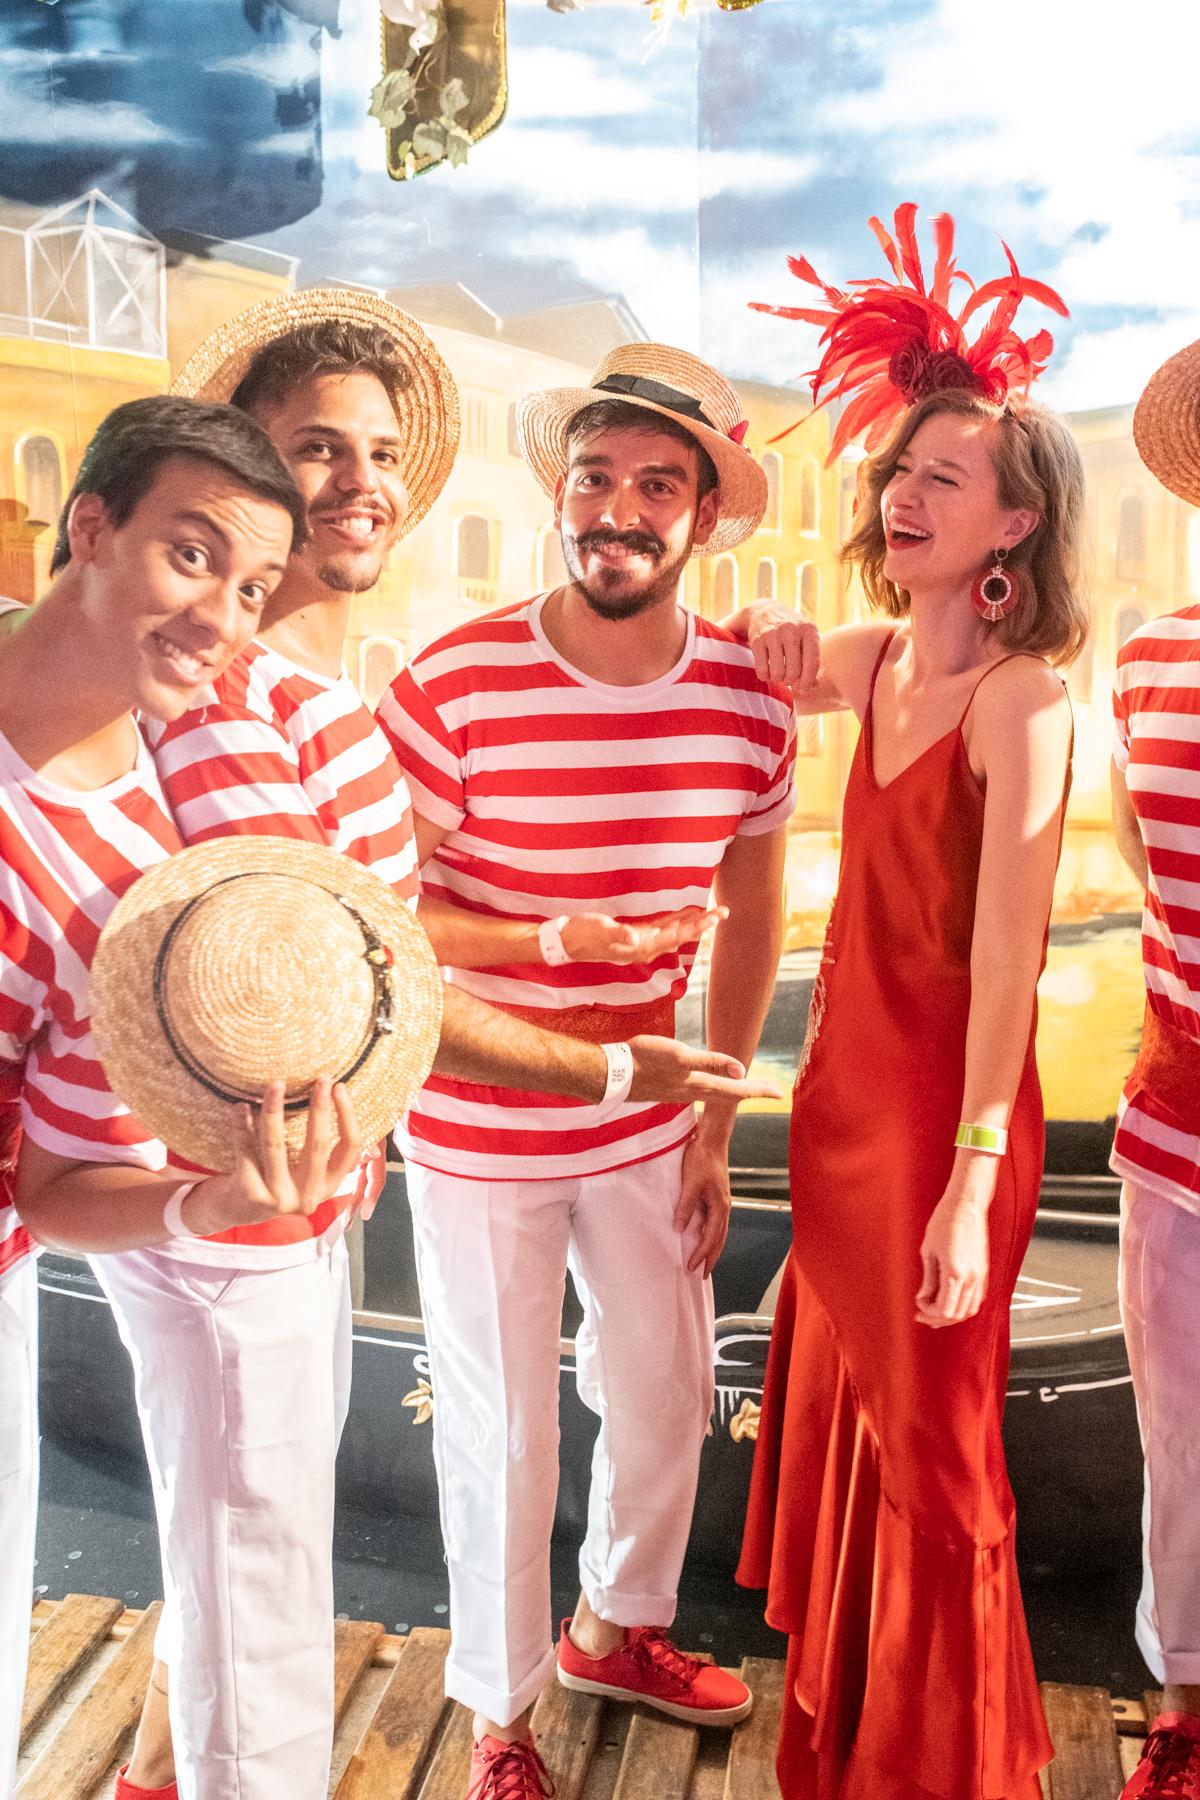 Stacie Flinner x Belmond Copacabana Carnival Ball-11.jpg